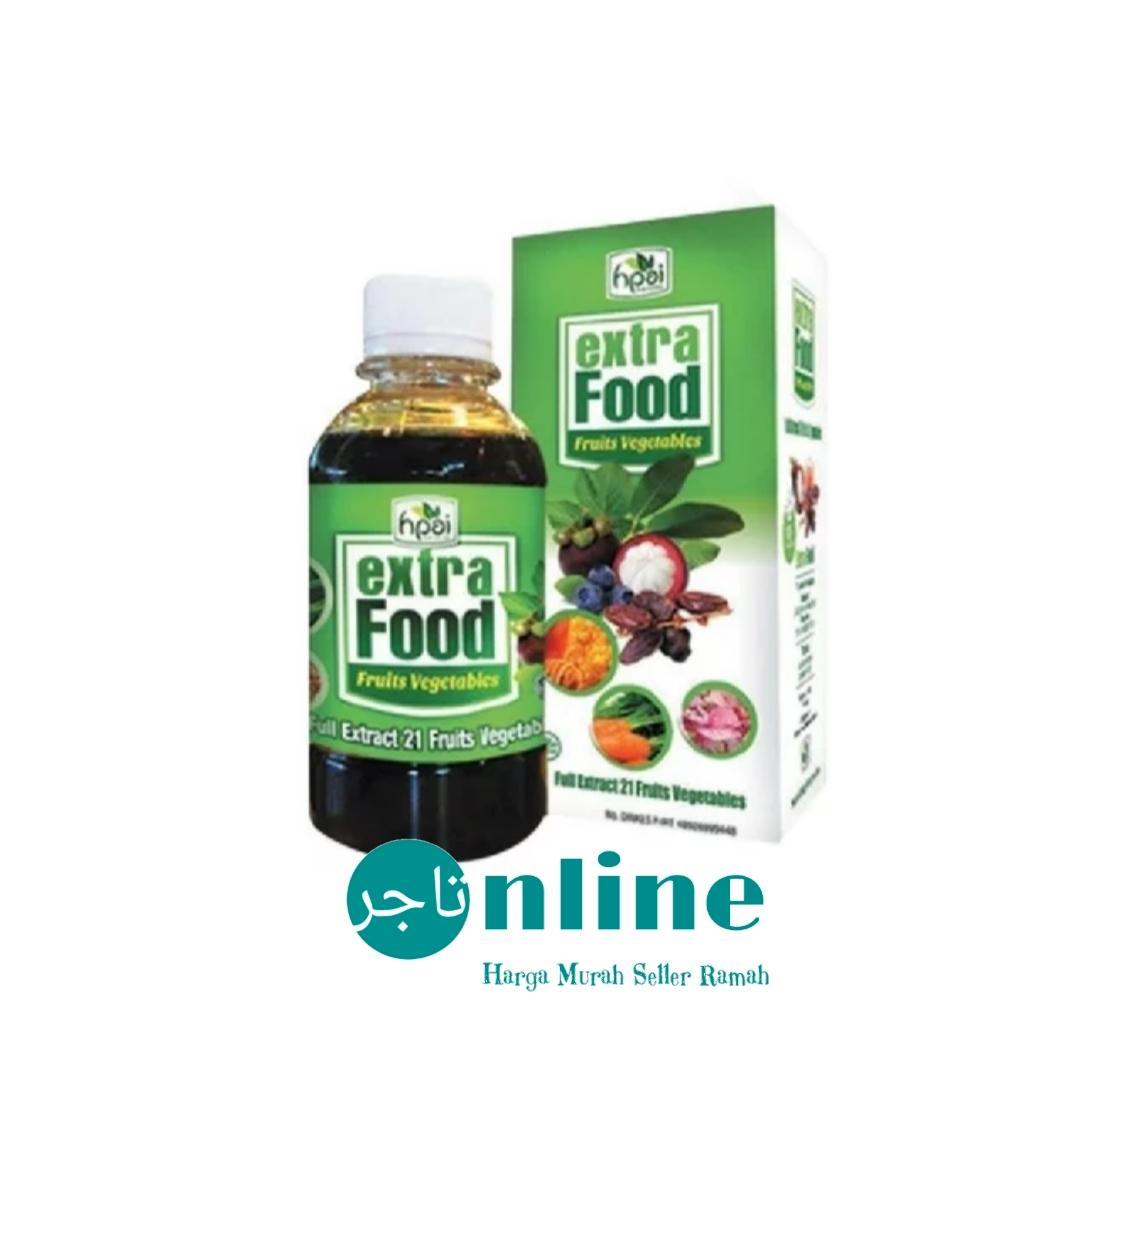 Paket Hemat 5 Botol Madu EXTRA FOOD HPAI 23 Fruit Vegetables Original